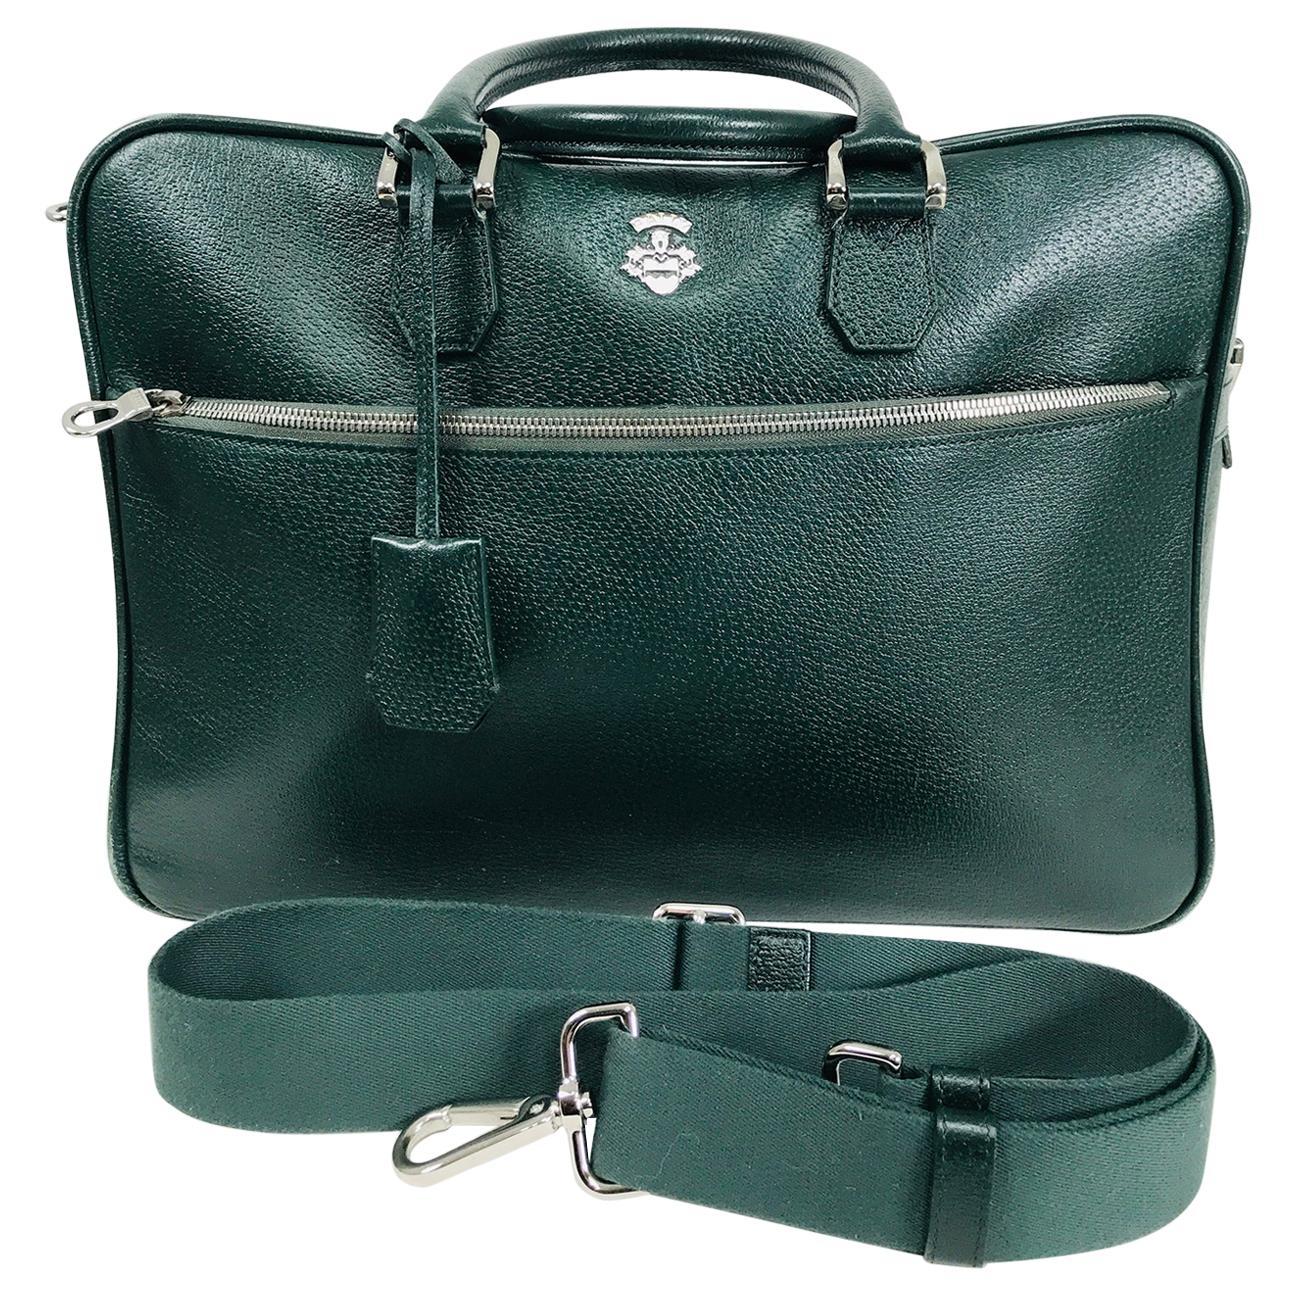 Bally Forest Green Pigskin Leather Carry On Business Bag Shoulder Strap